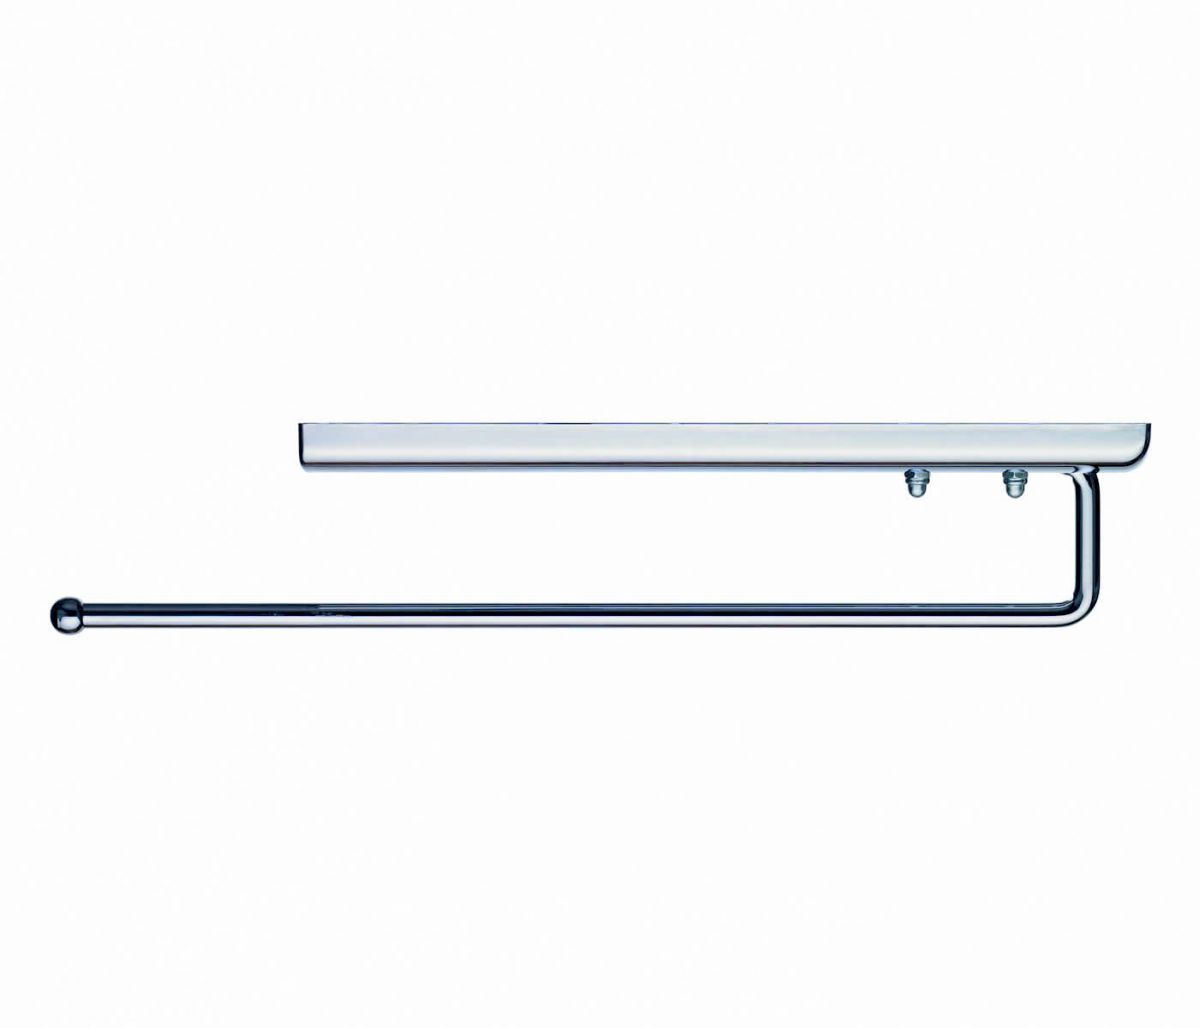 Ideal standard daylight chrome towel rail ukbathrooms - Bathroom accessories towel rail ...